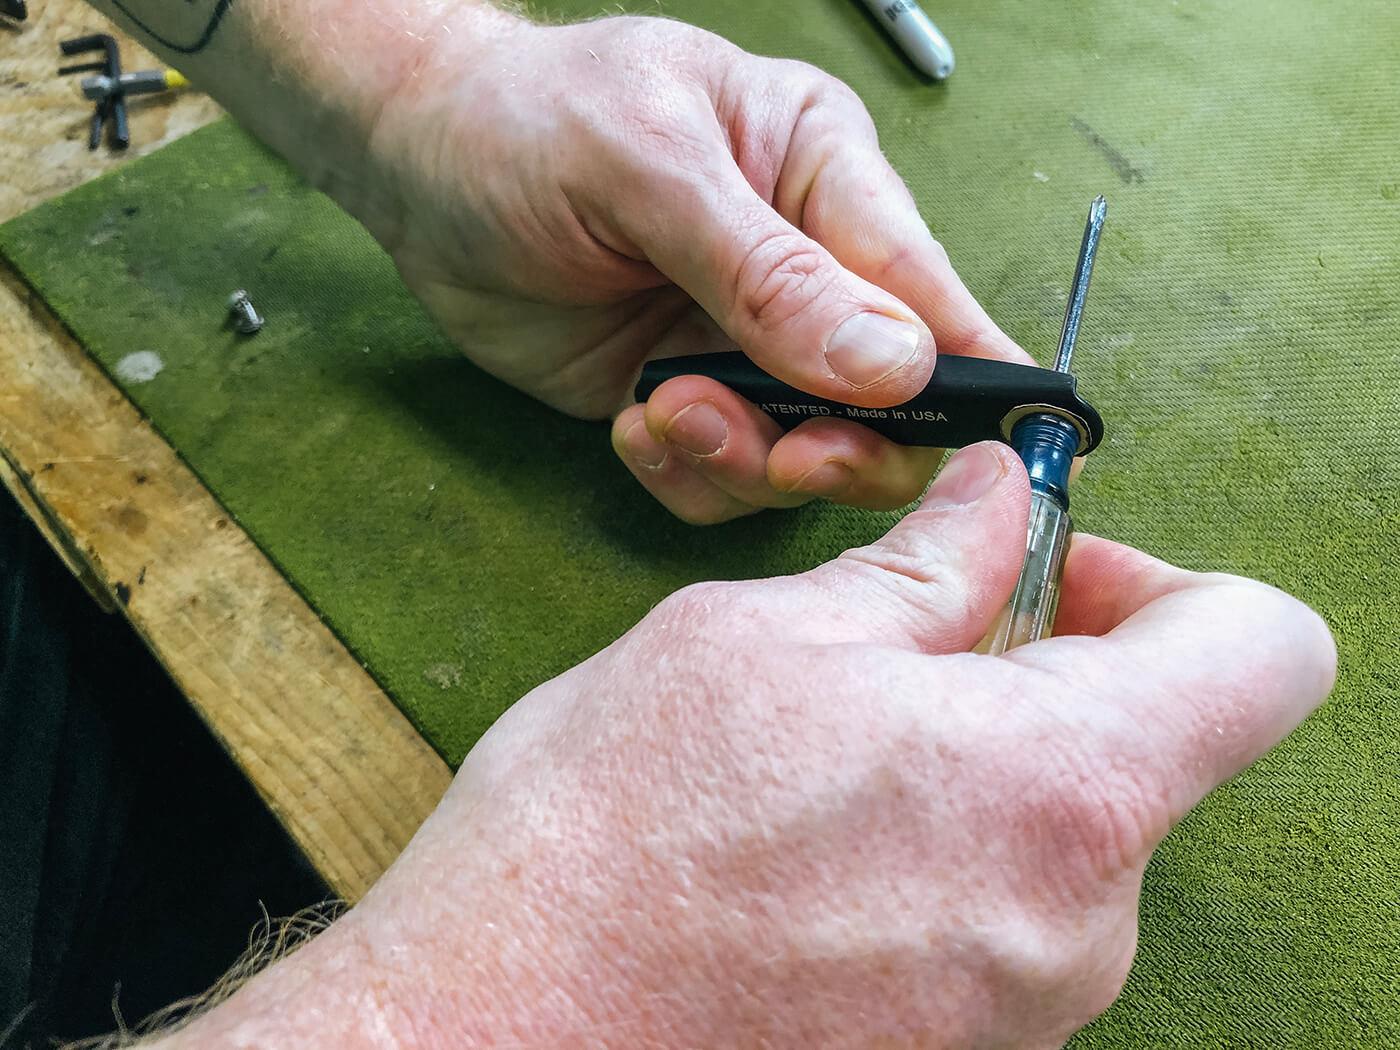 GM392 DIY2 Grounding Issues 6